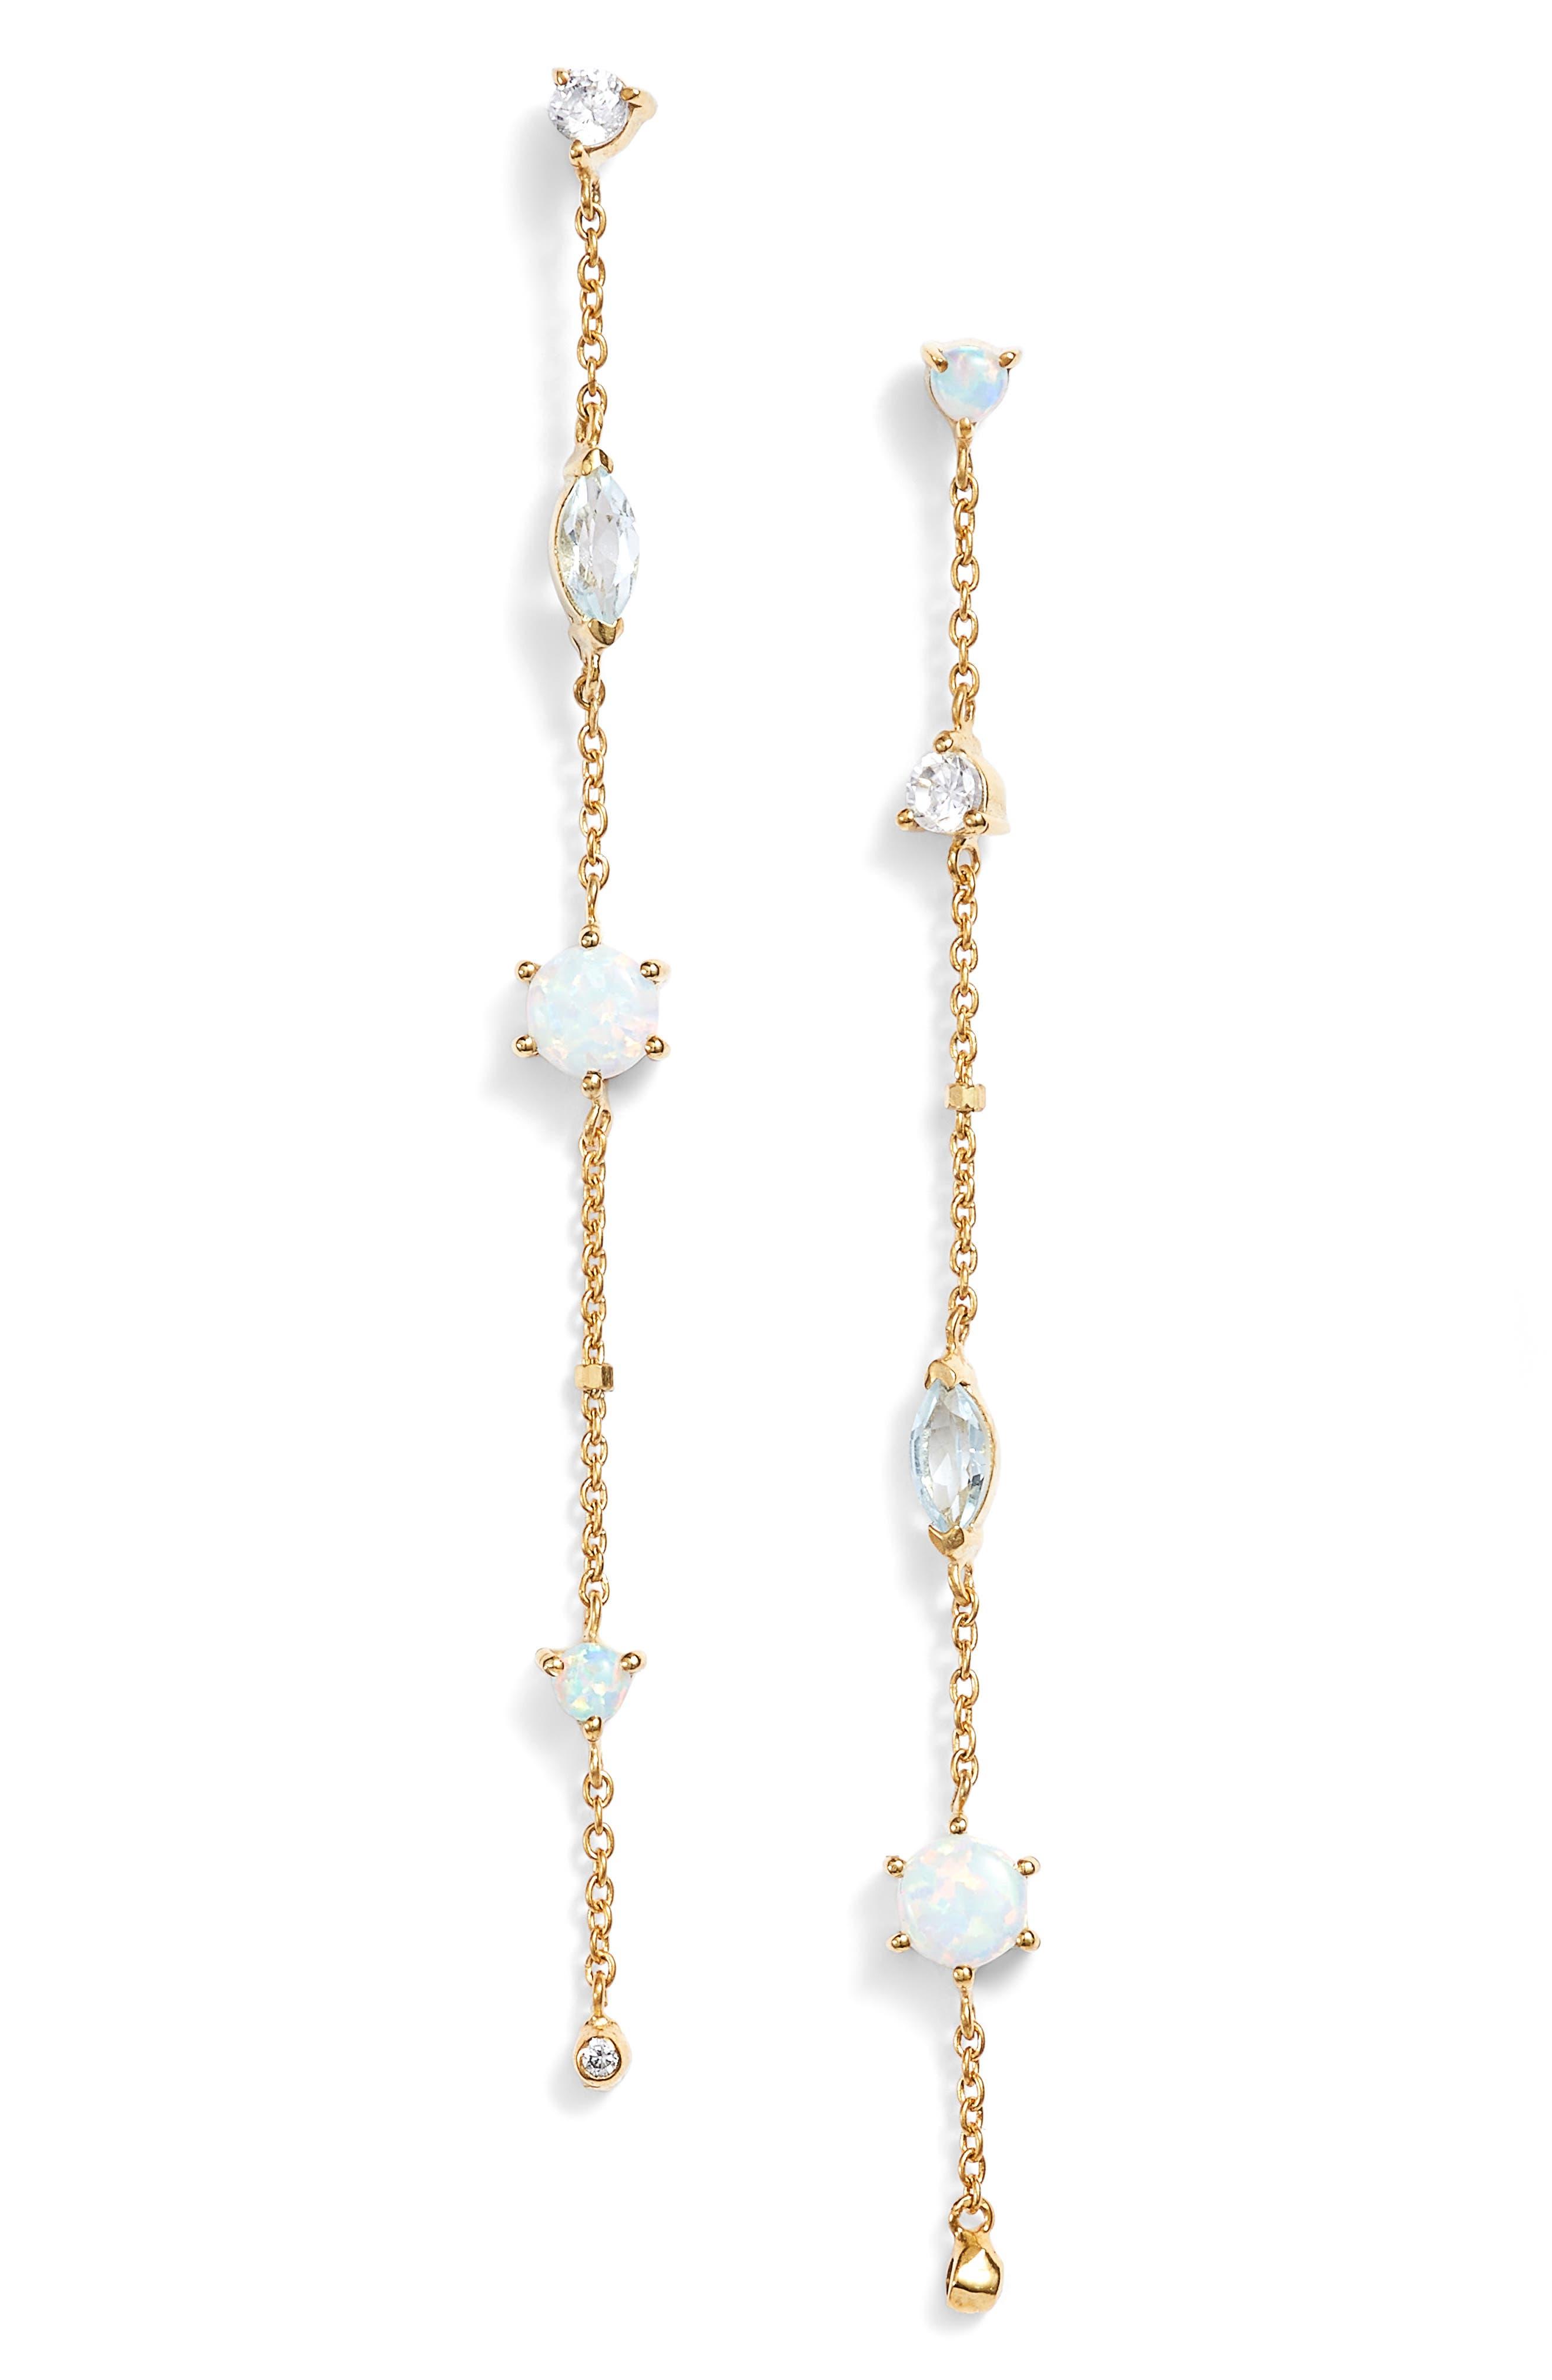 Sydney Multistone Chain Earrings,                         Main,                         color, Gold